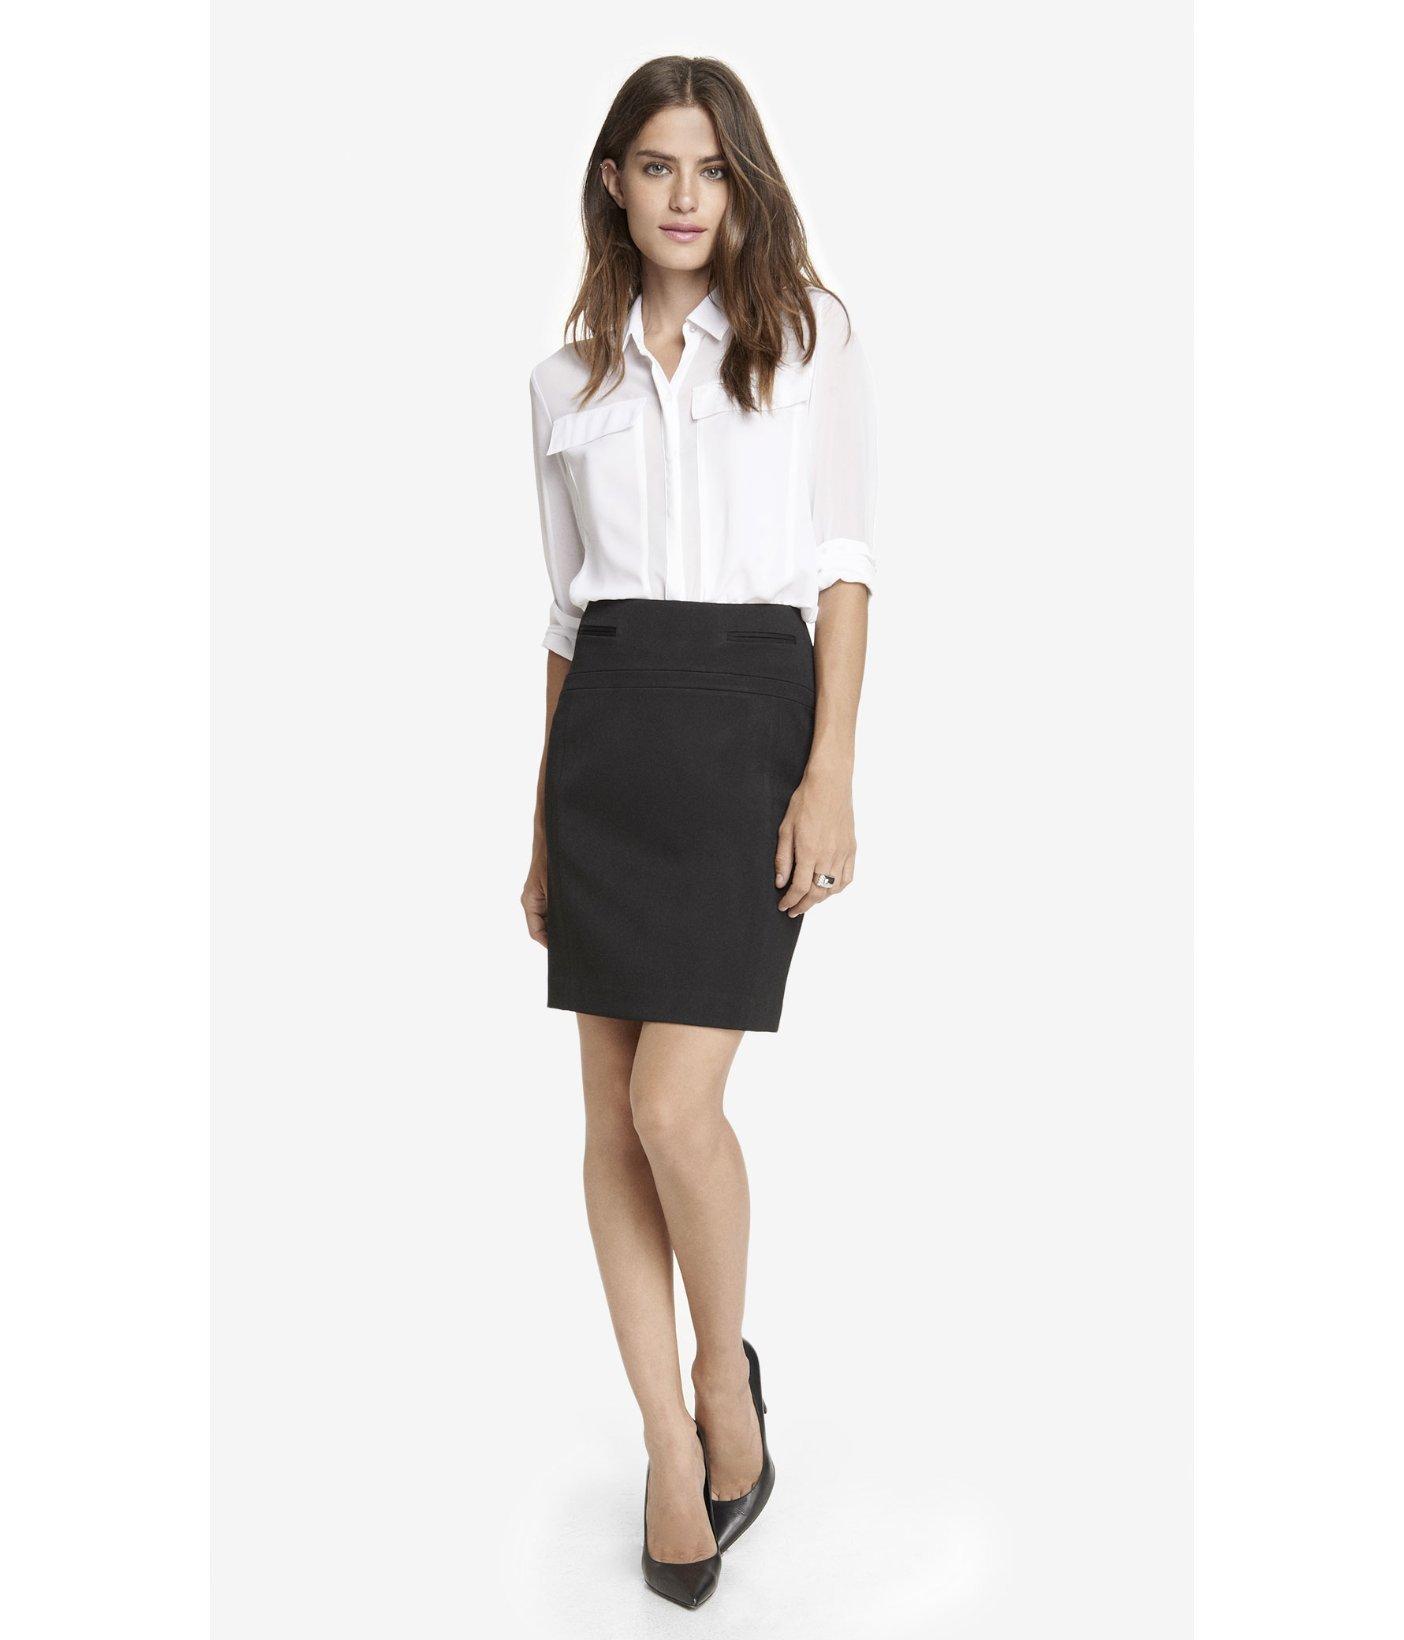 black pencil skirt with pockets dress ala